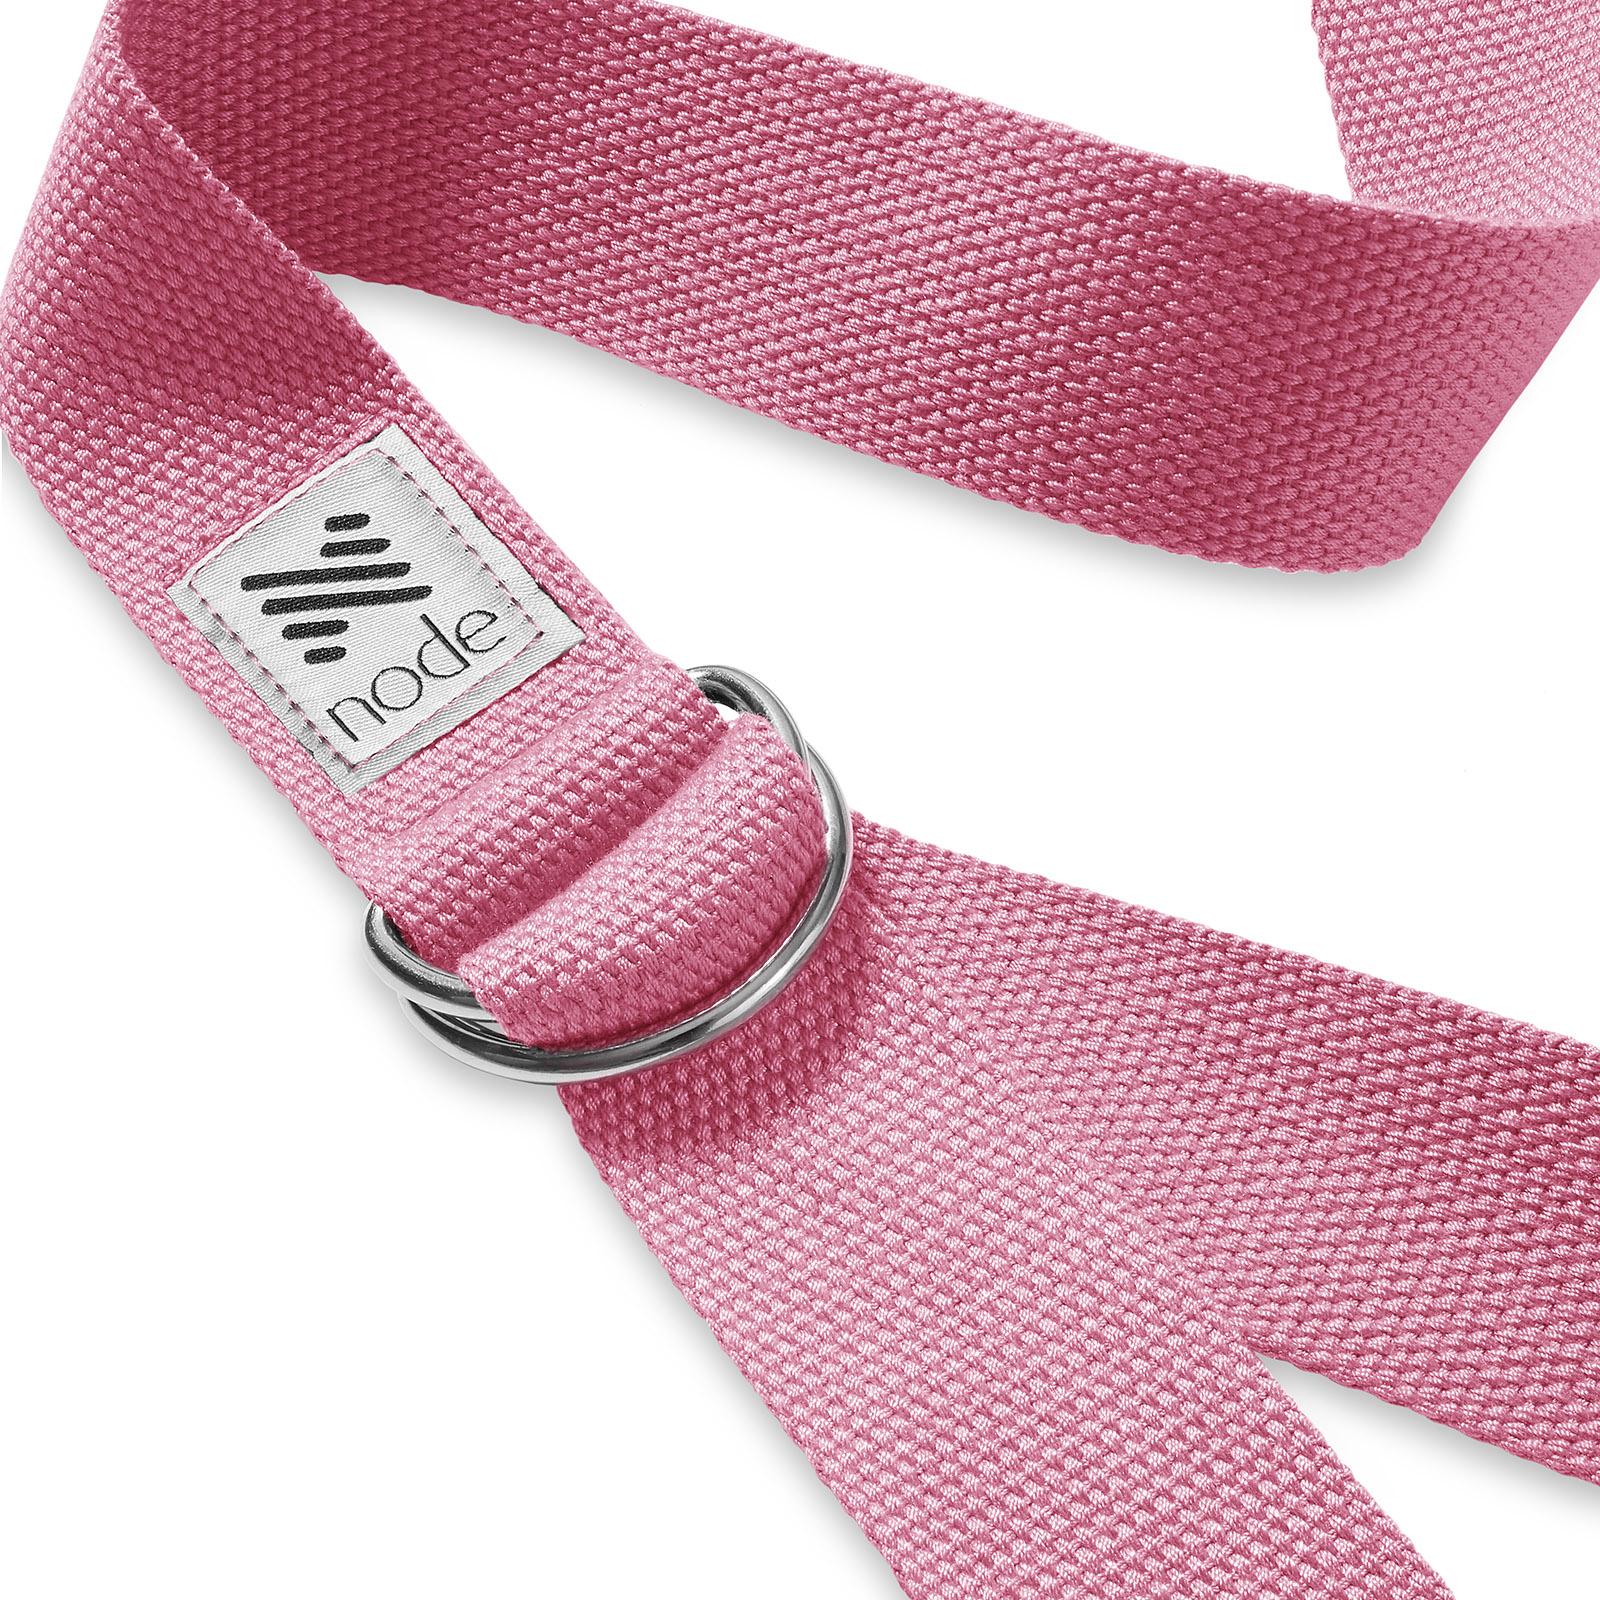 7-1-2-039-Woven-Cotton-Blend-Yoga-Strap-Stretching-Exercise-Prop-Belt thumbnail 20